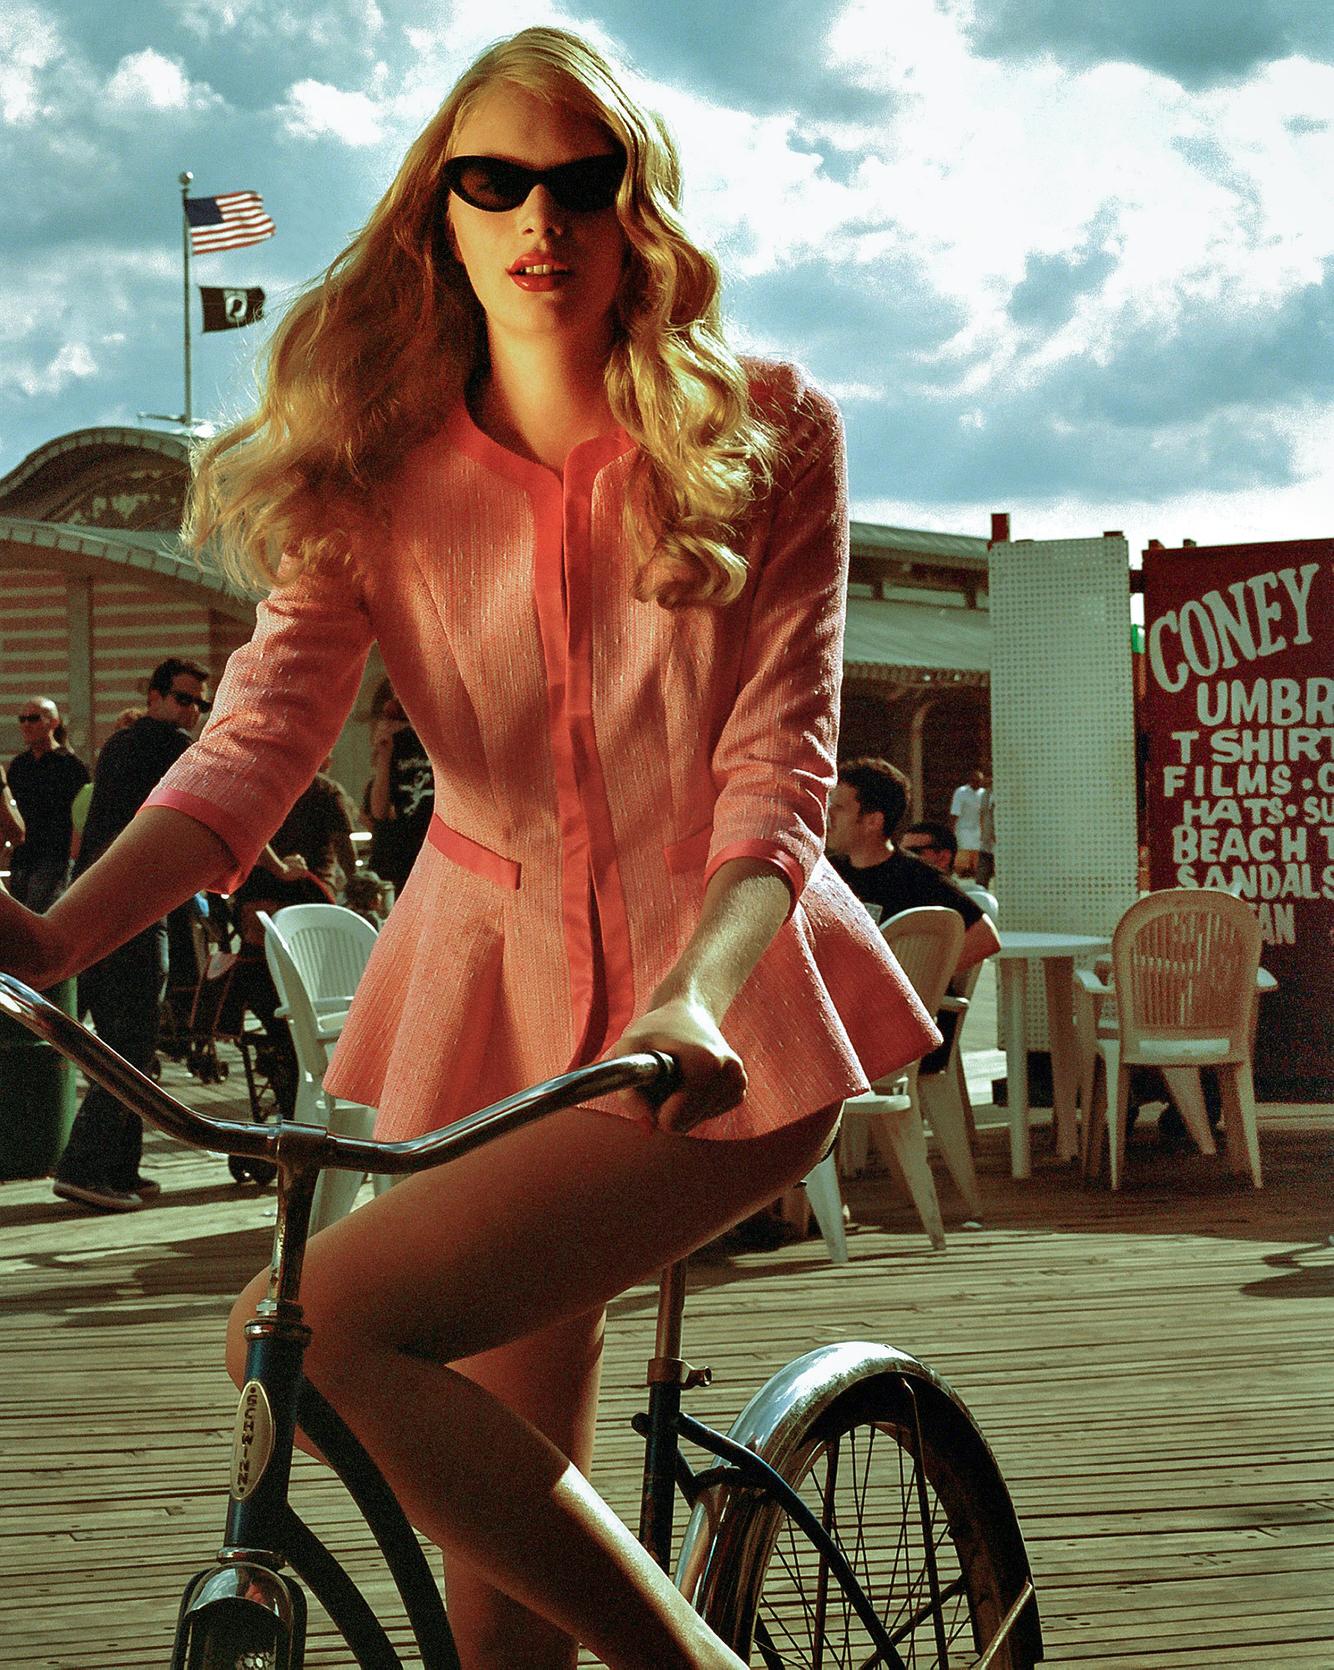 Niv_shank_fashion_coney_island_New-york.jpg